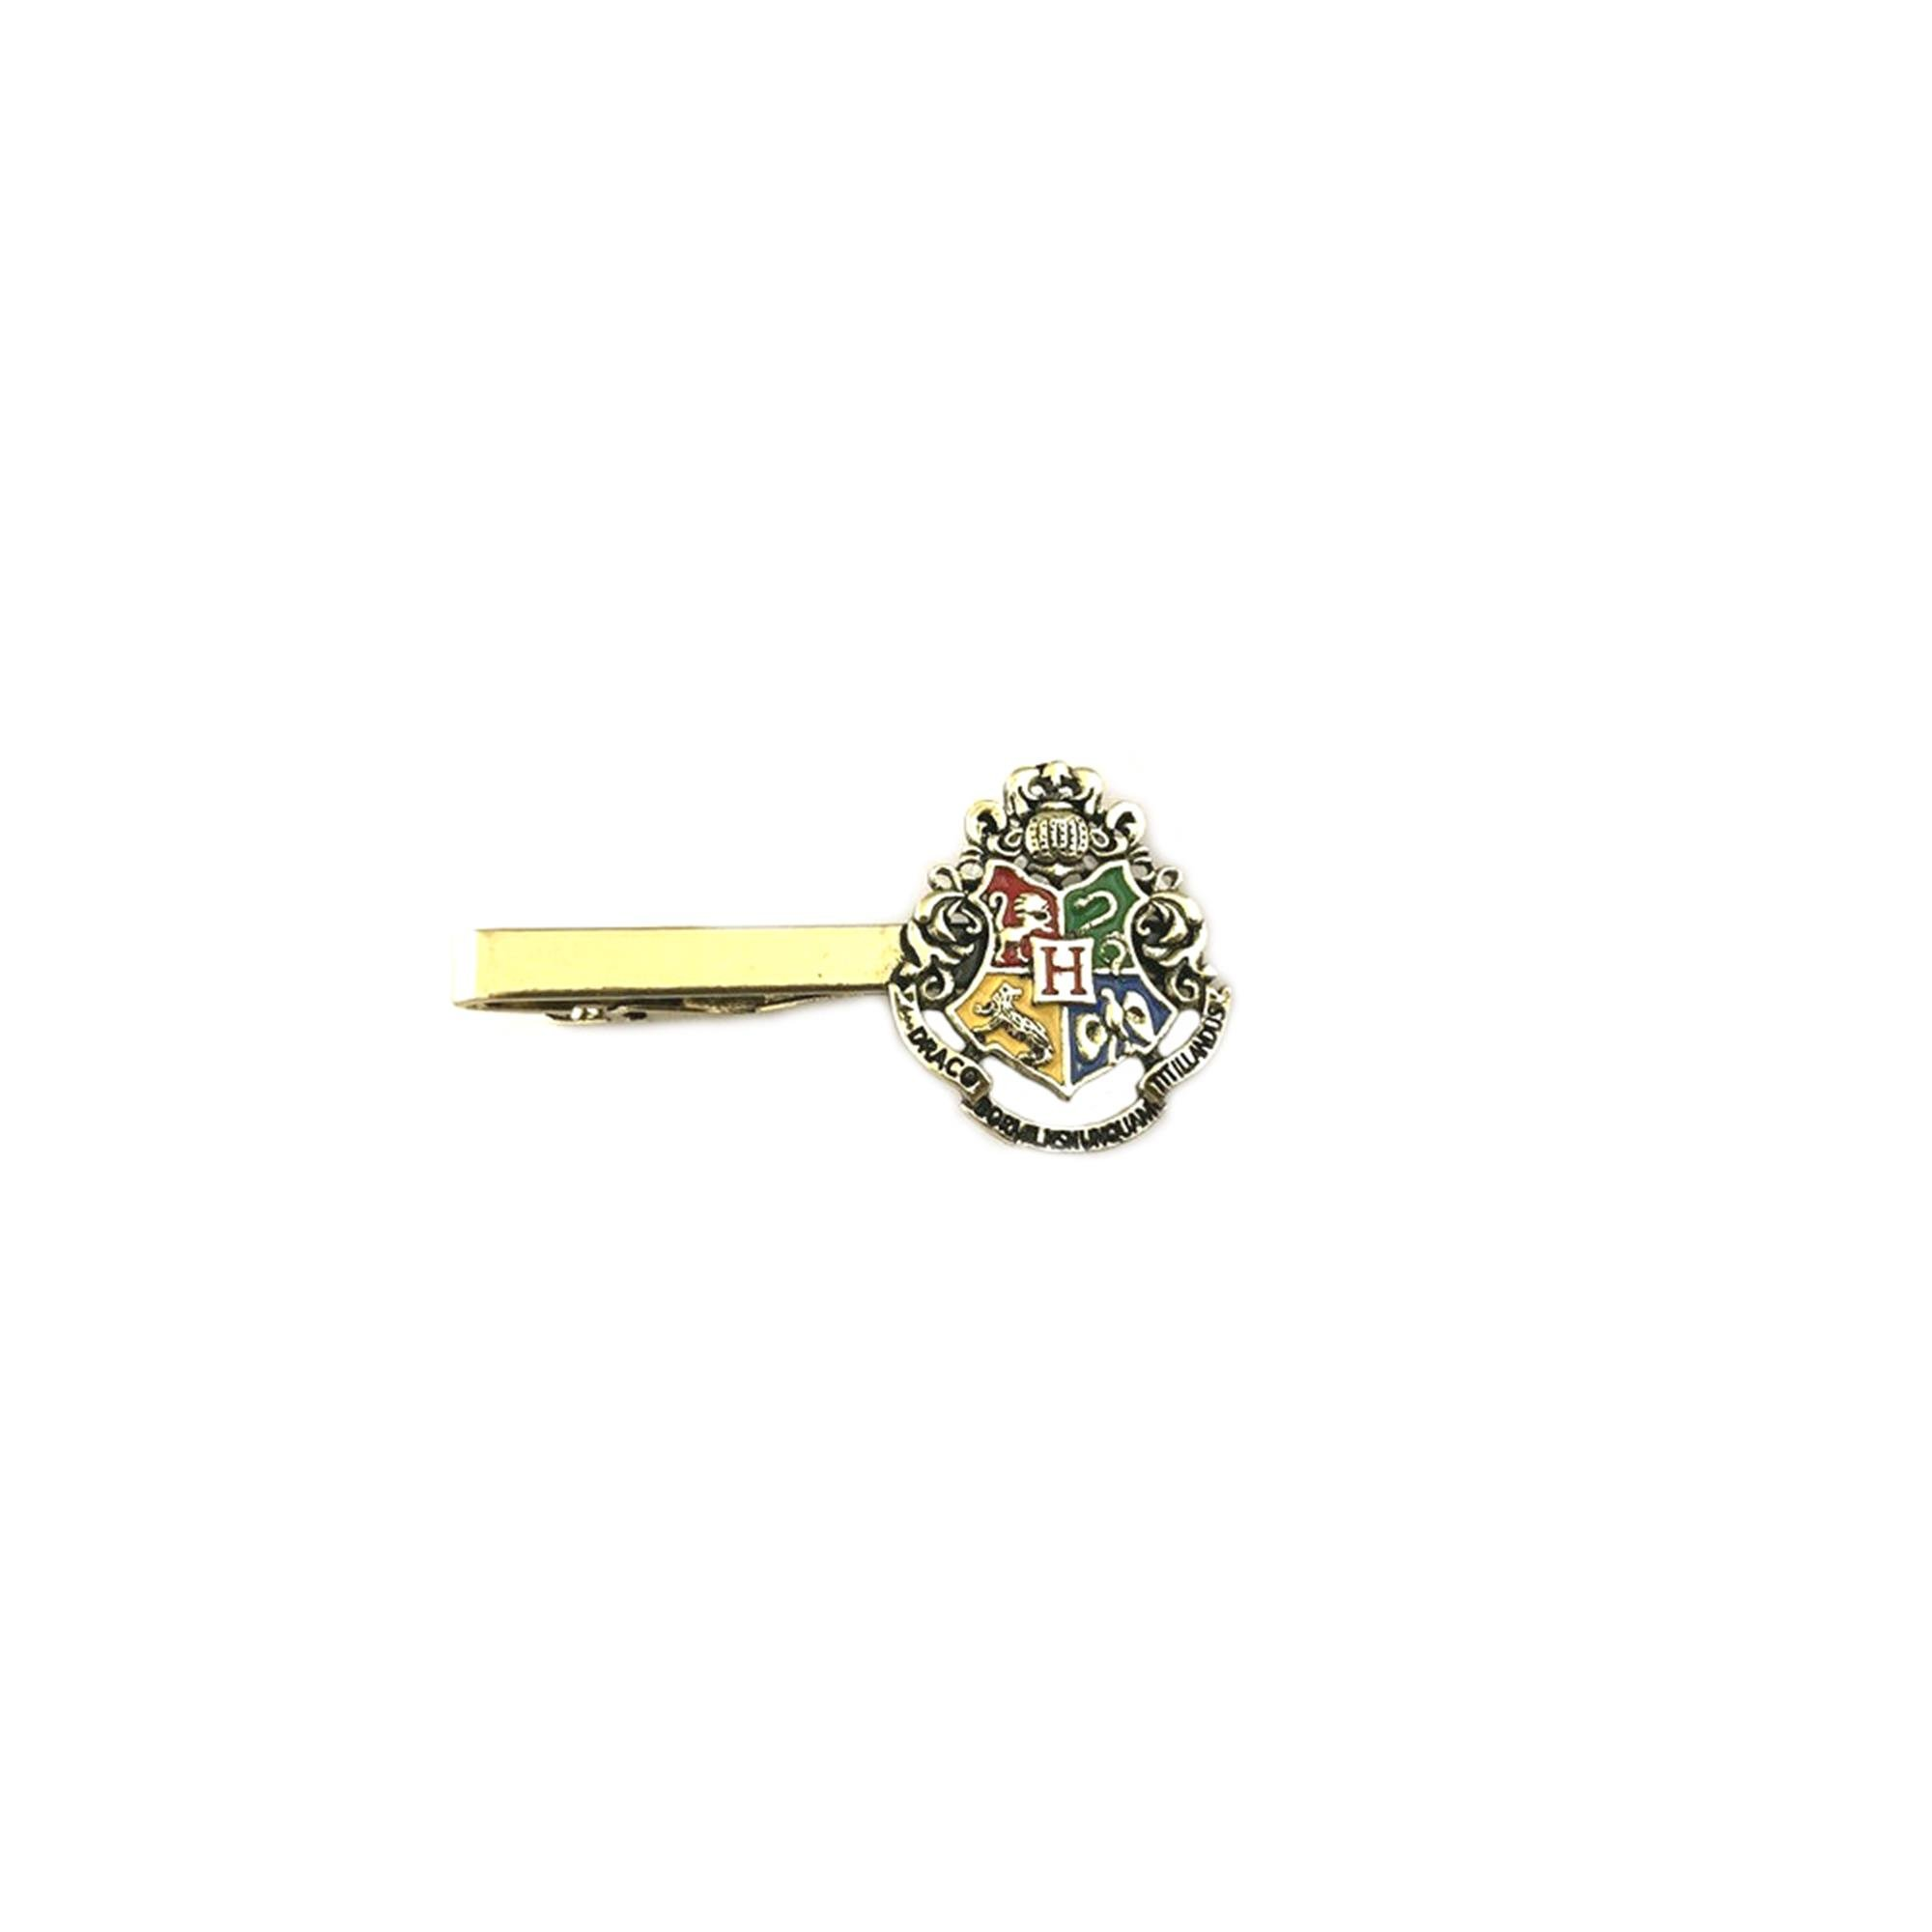 Athena Brand Movie Novel Harry Potter Hogwarts Crest Tie Bar In Gift Box by Athena Brand (Image #1)